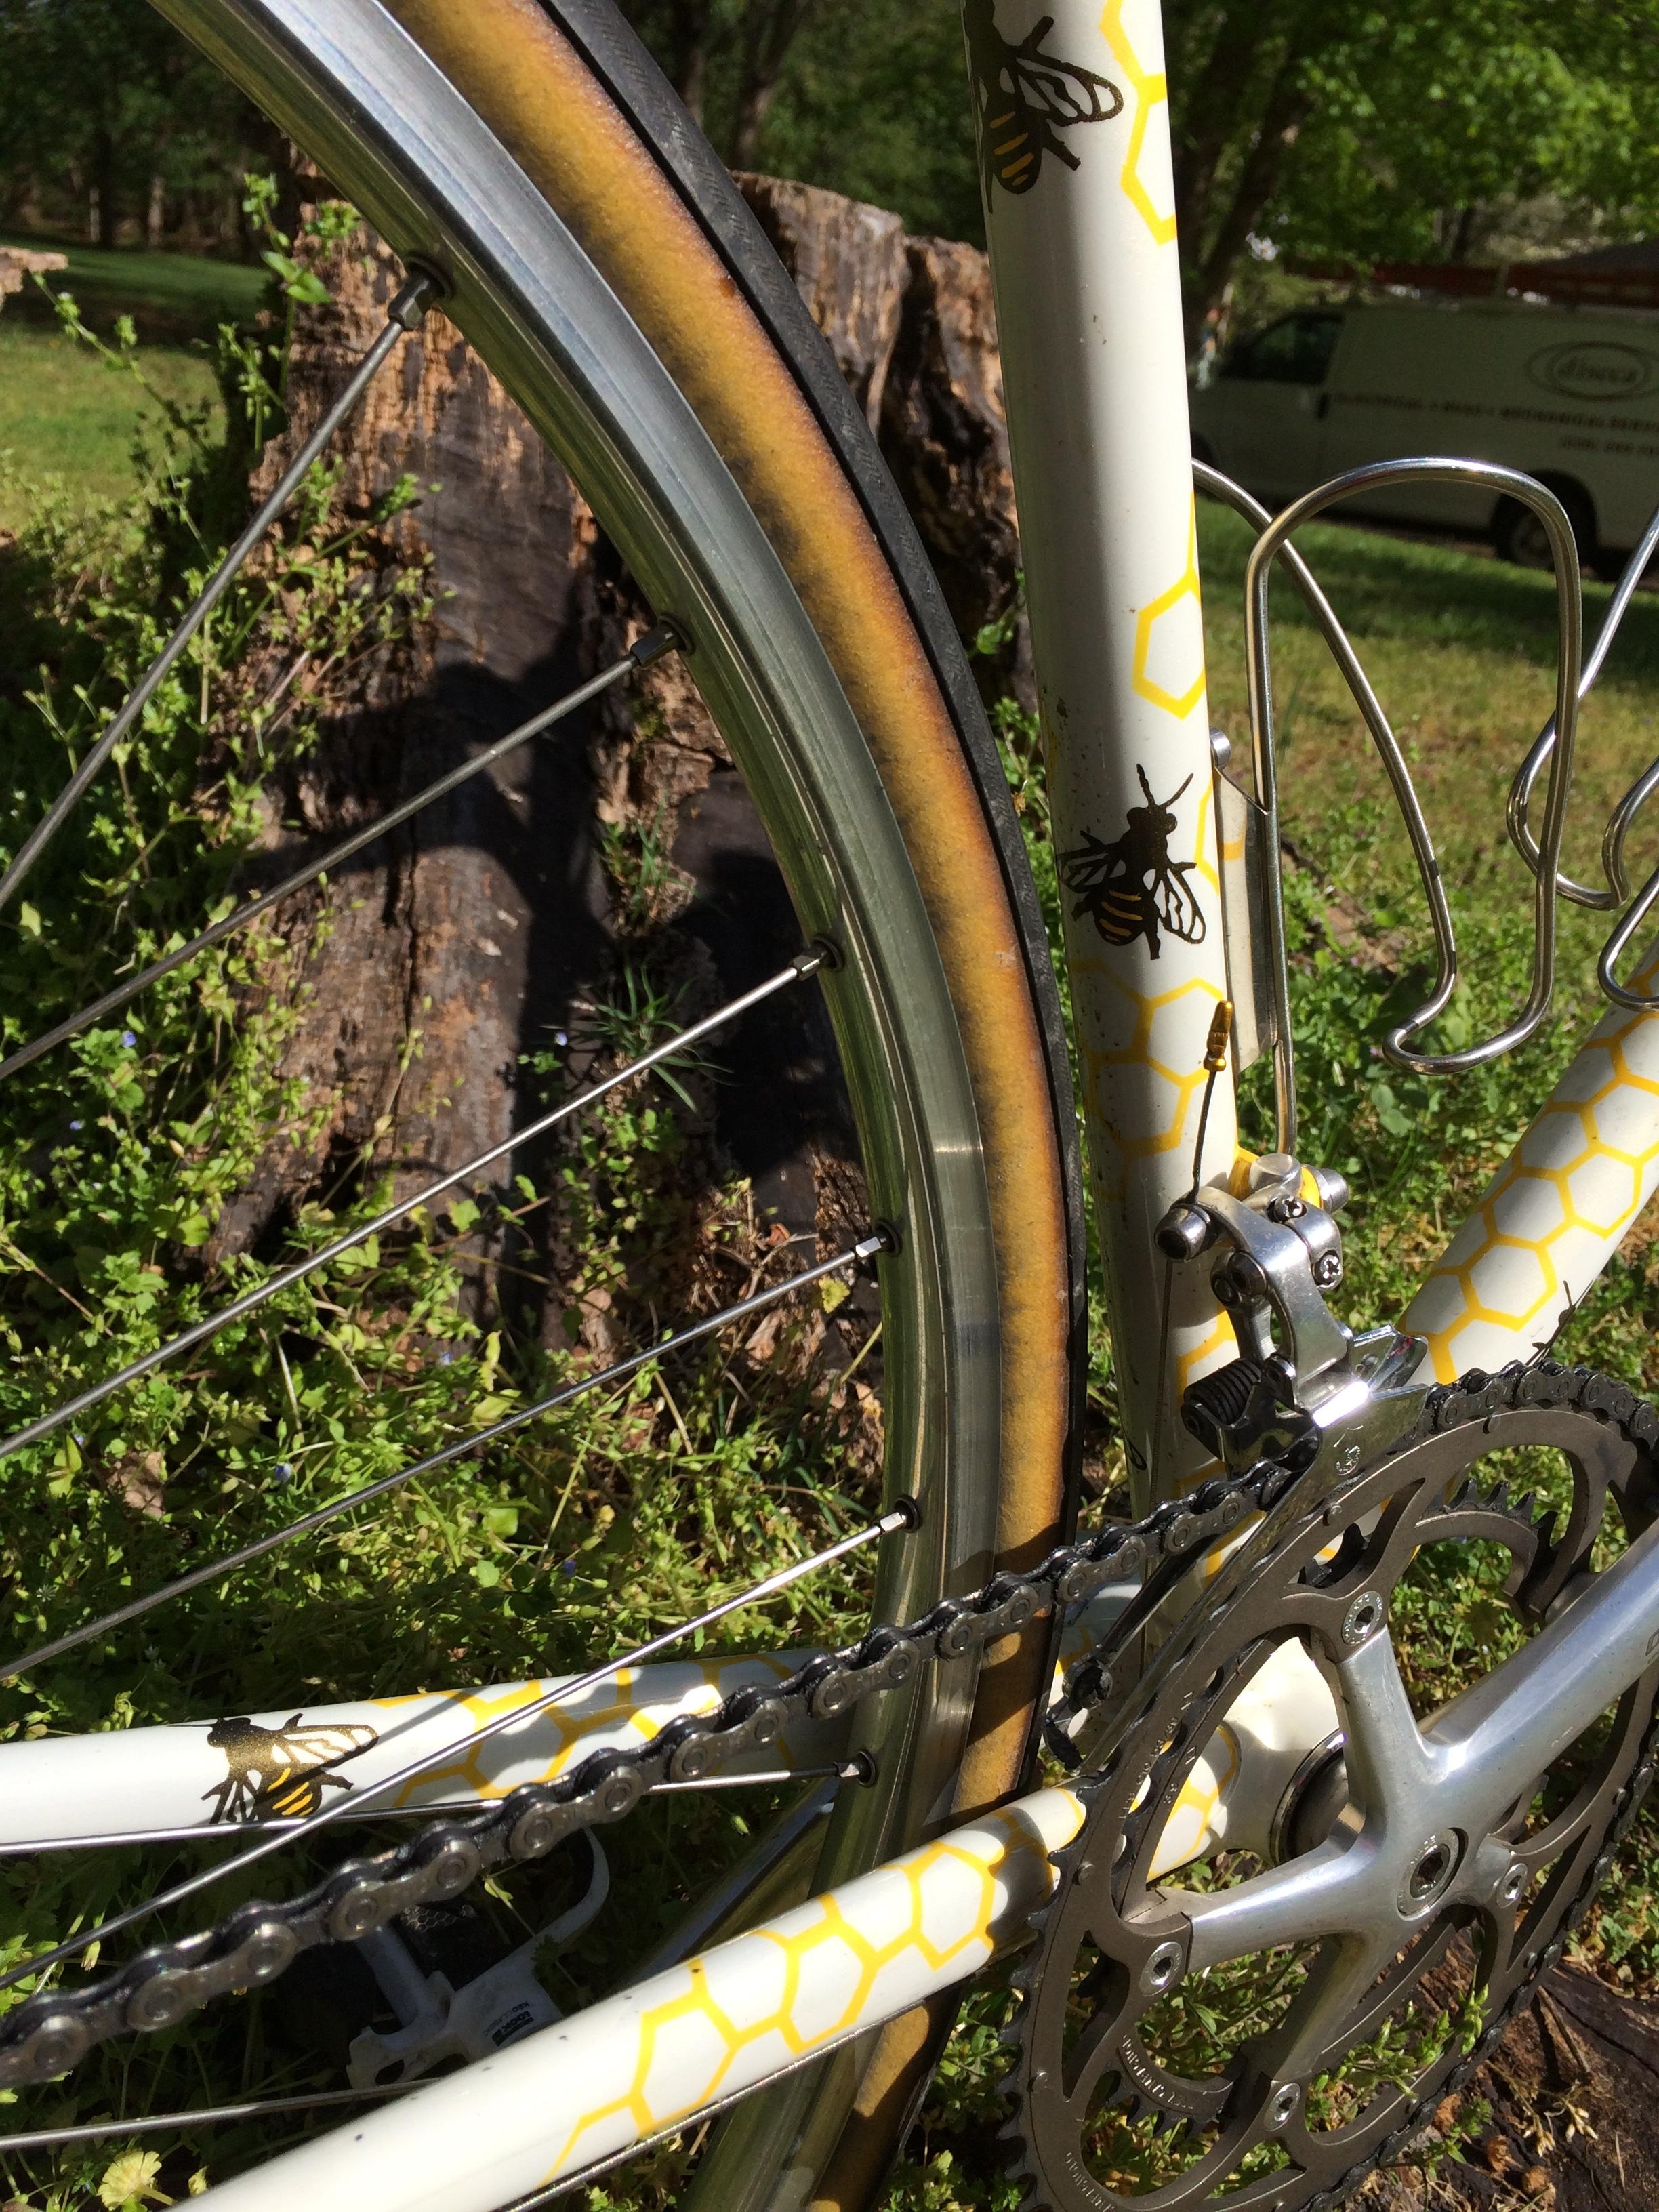 Dogwood-Cycleworx-steel-road-bicycle-columbus-tubing-custom-hand-made-3.jpg